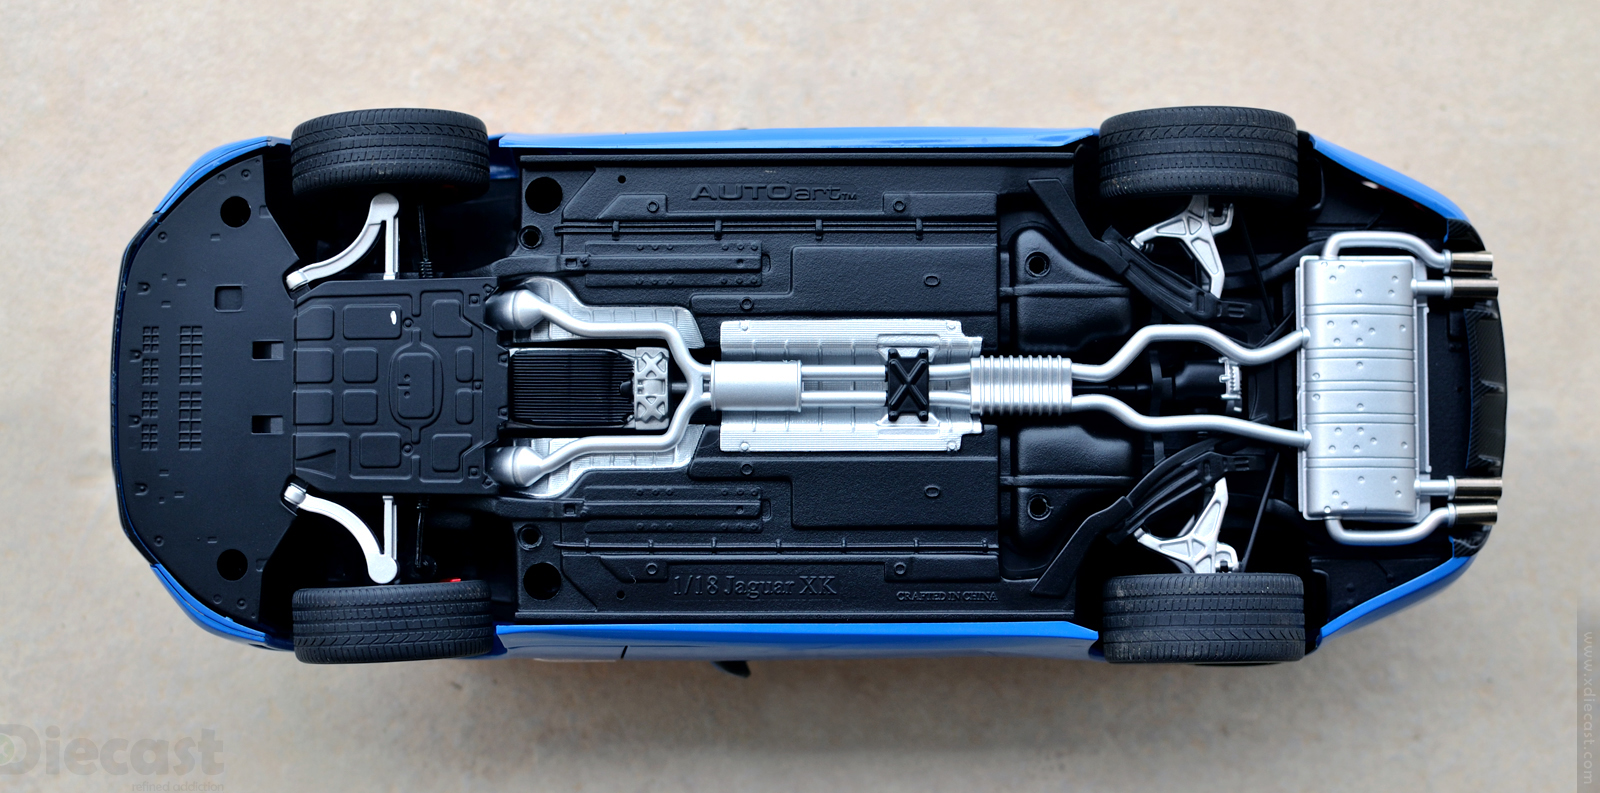 AUTOart Jaguar XKR-S - Underbody